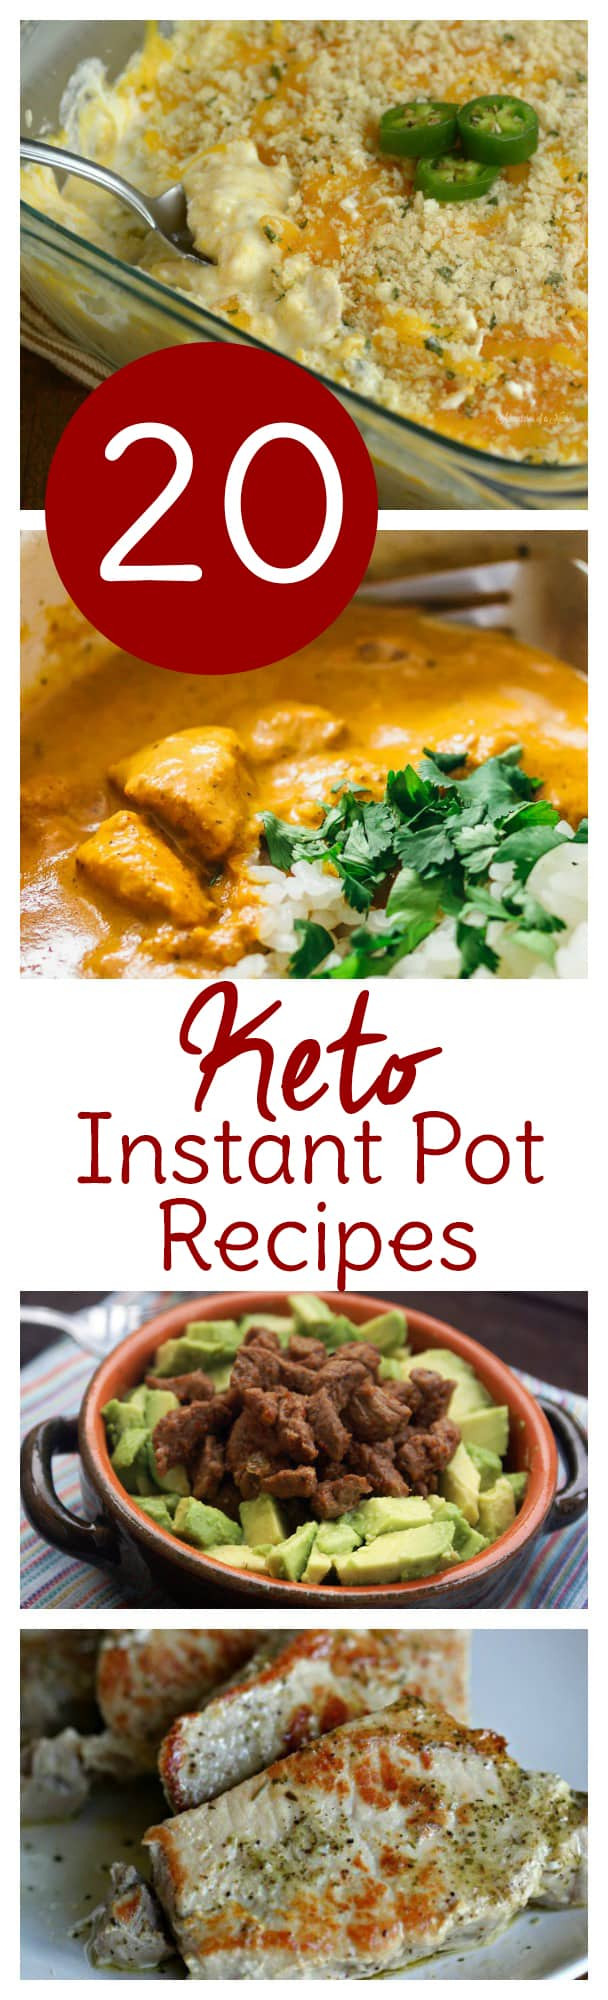 Instapot Keto Recipes  20 Instant Pot Keto Recipes to Make This Week